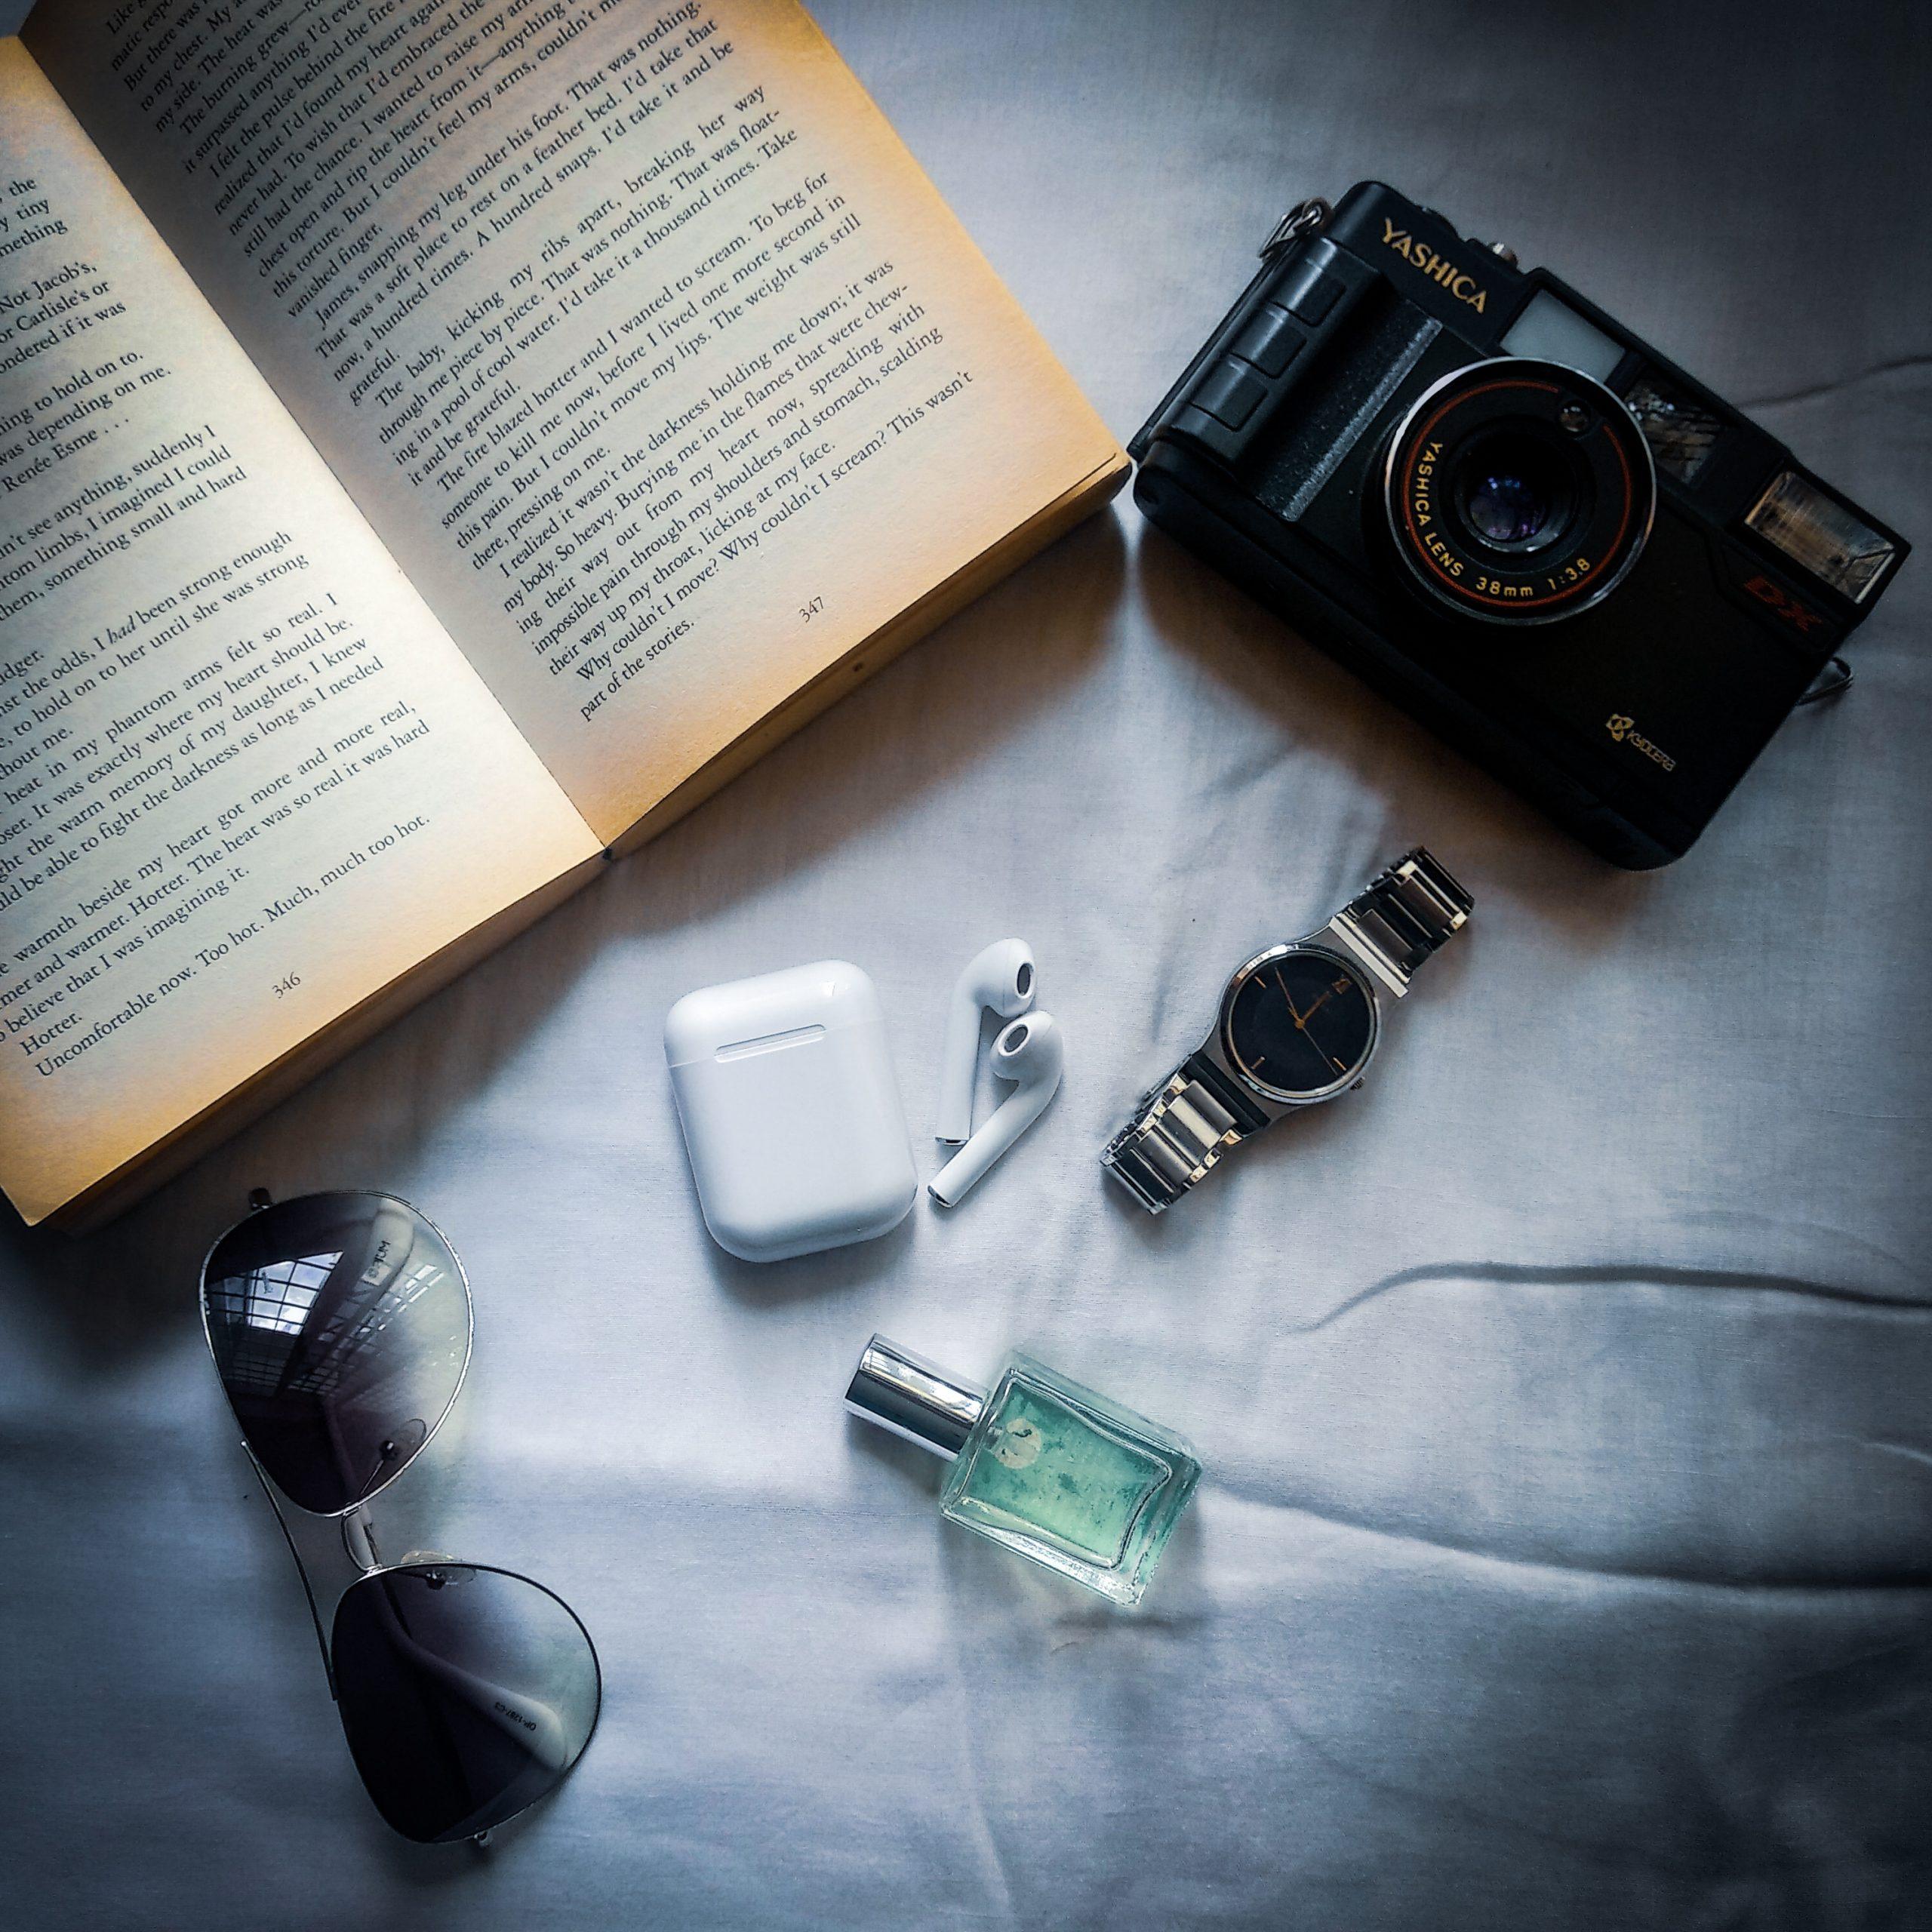 Book, camera and accessories